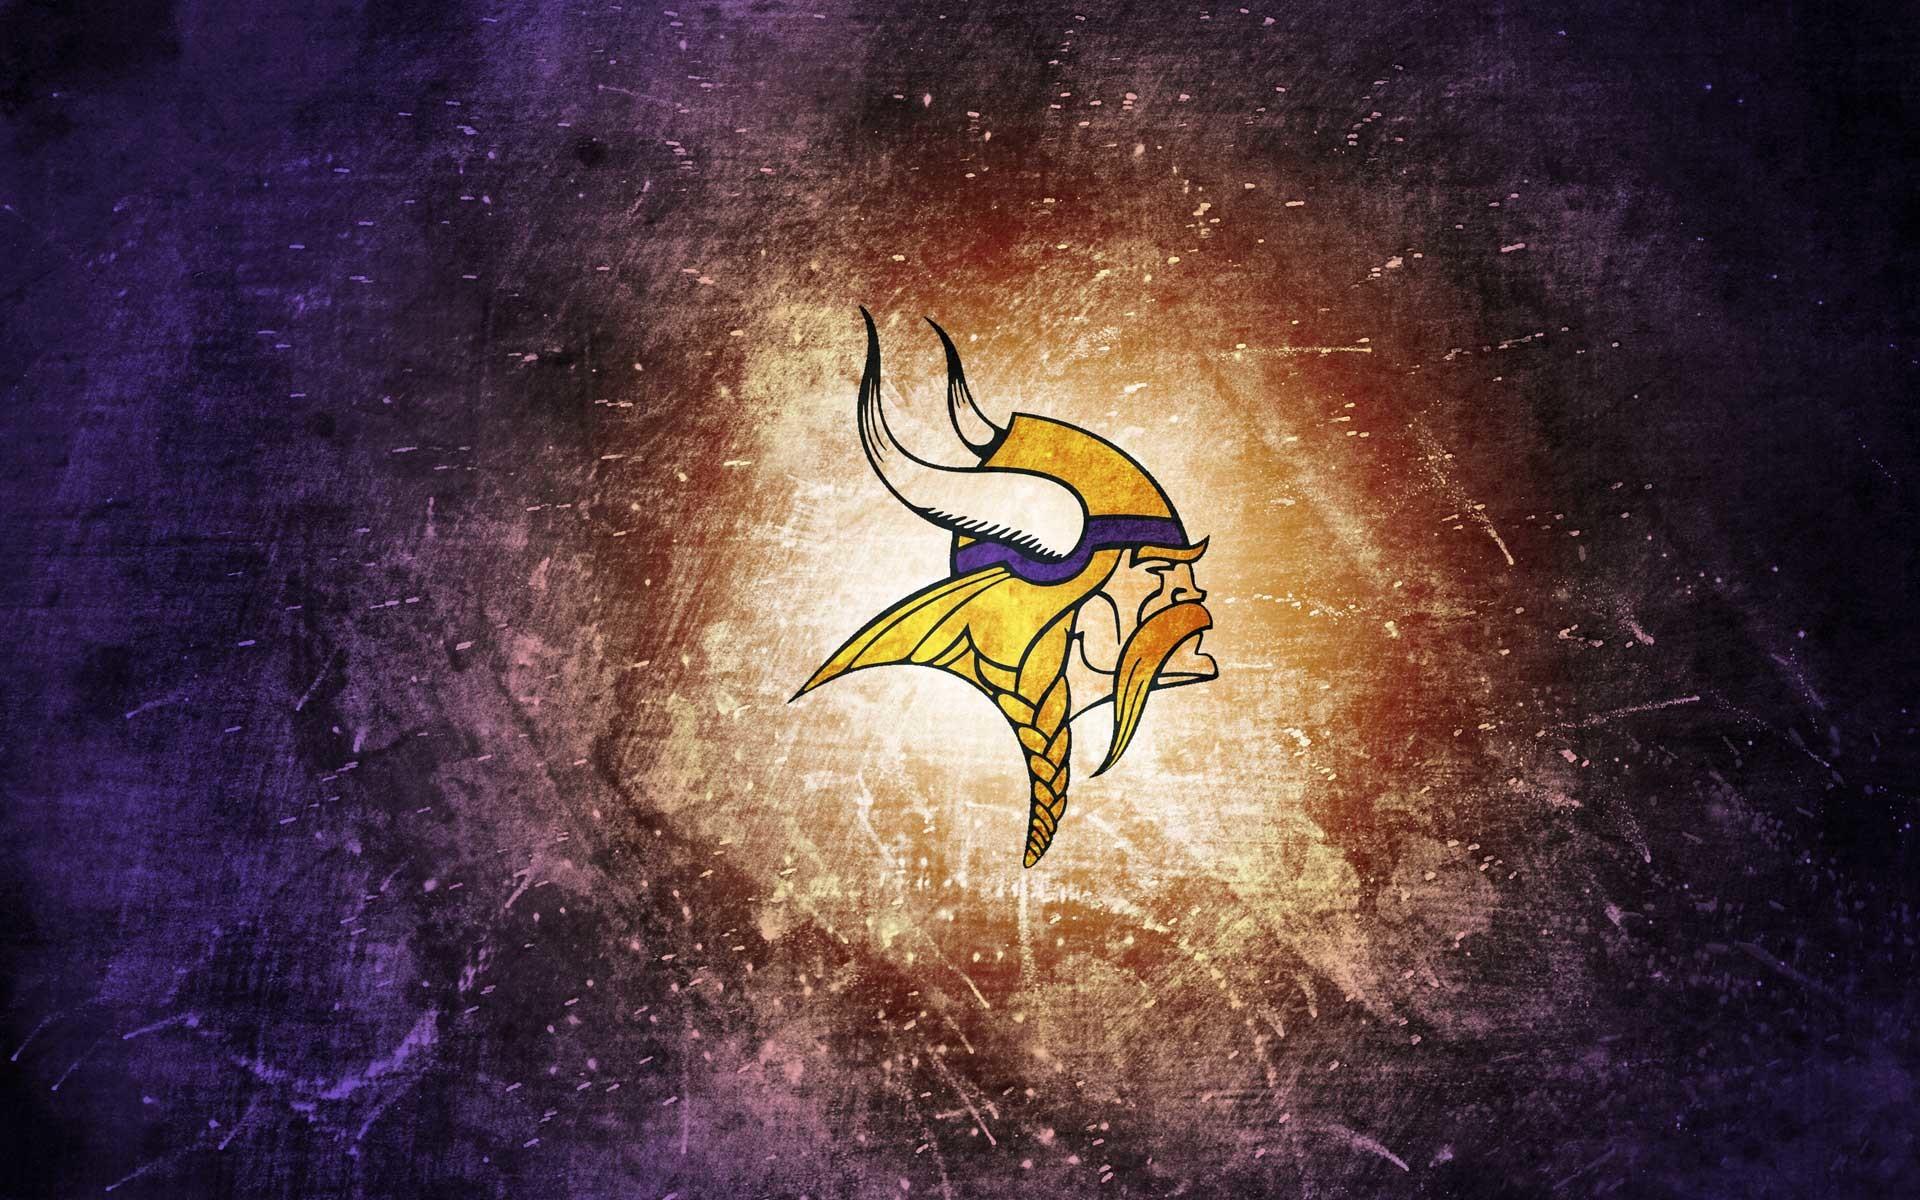 Minnesota Vikings Wallpapers | HD Wallpapers Early